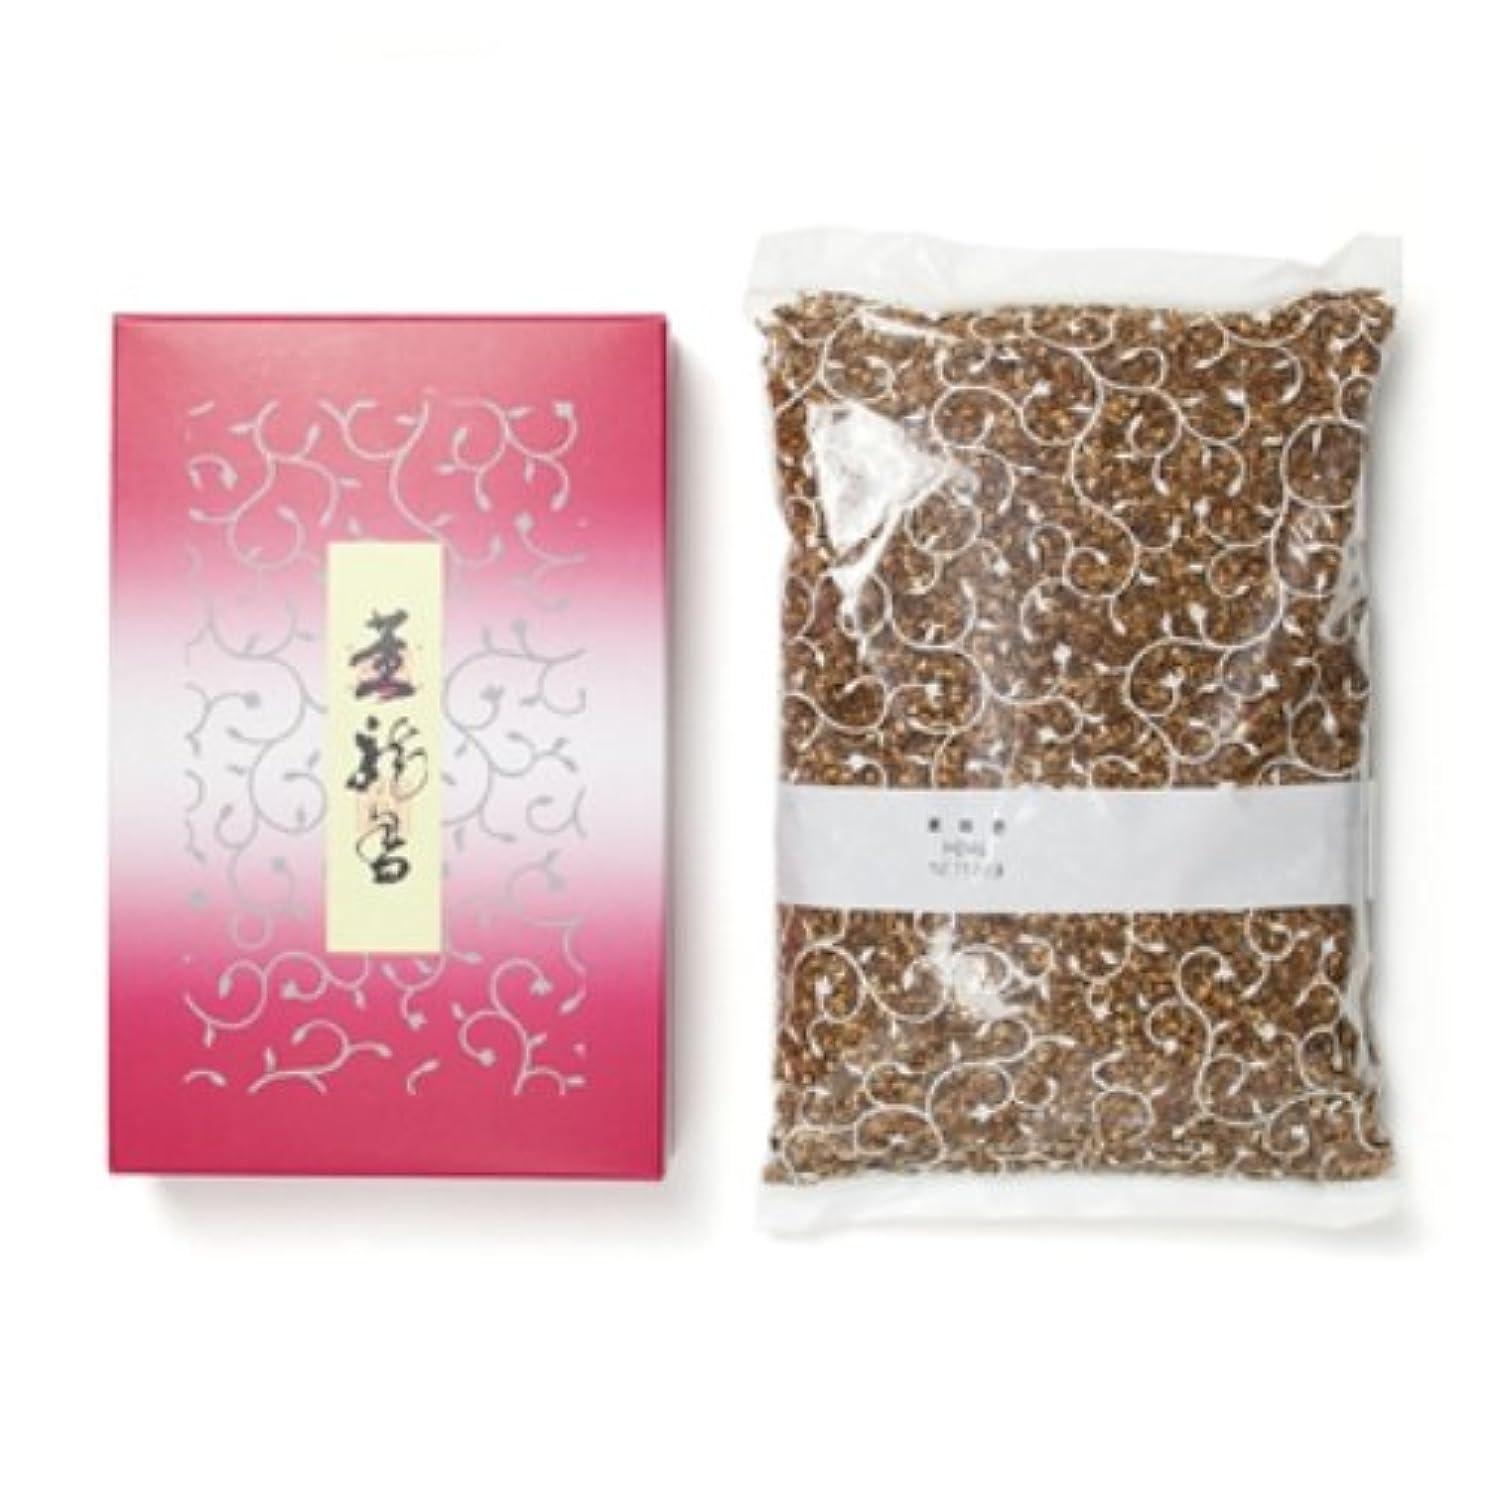 嵐の構造的雑品松栄堂のお焼香 薫竜香 500g詰 紙箱入 #410211